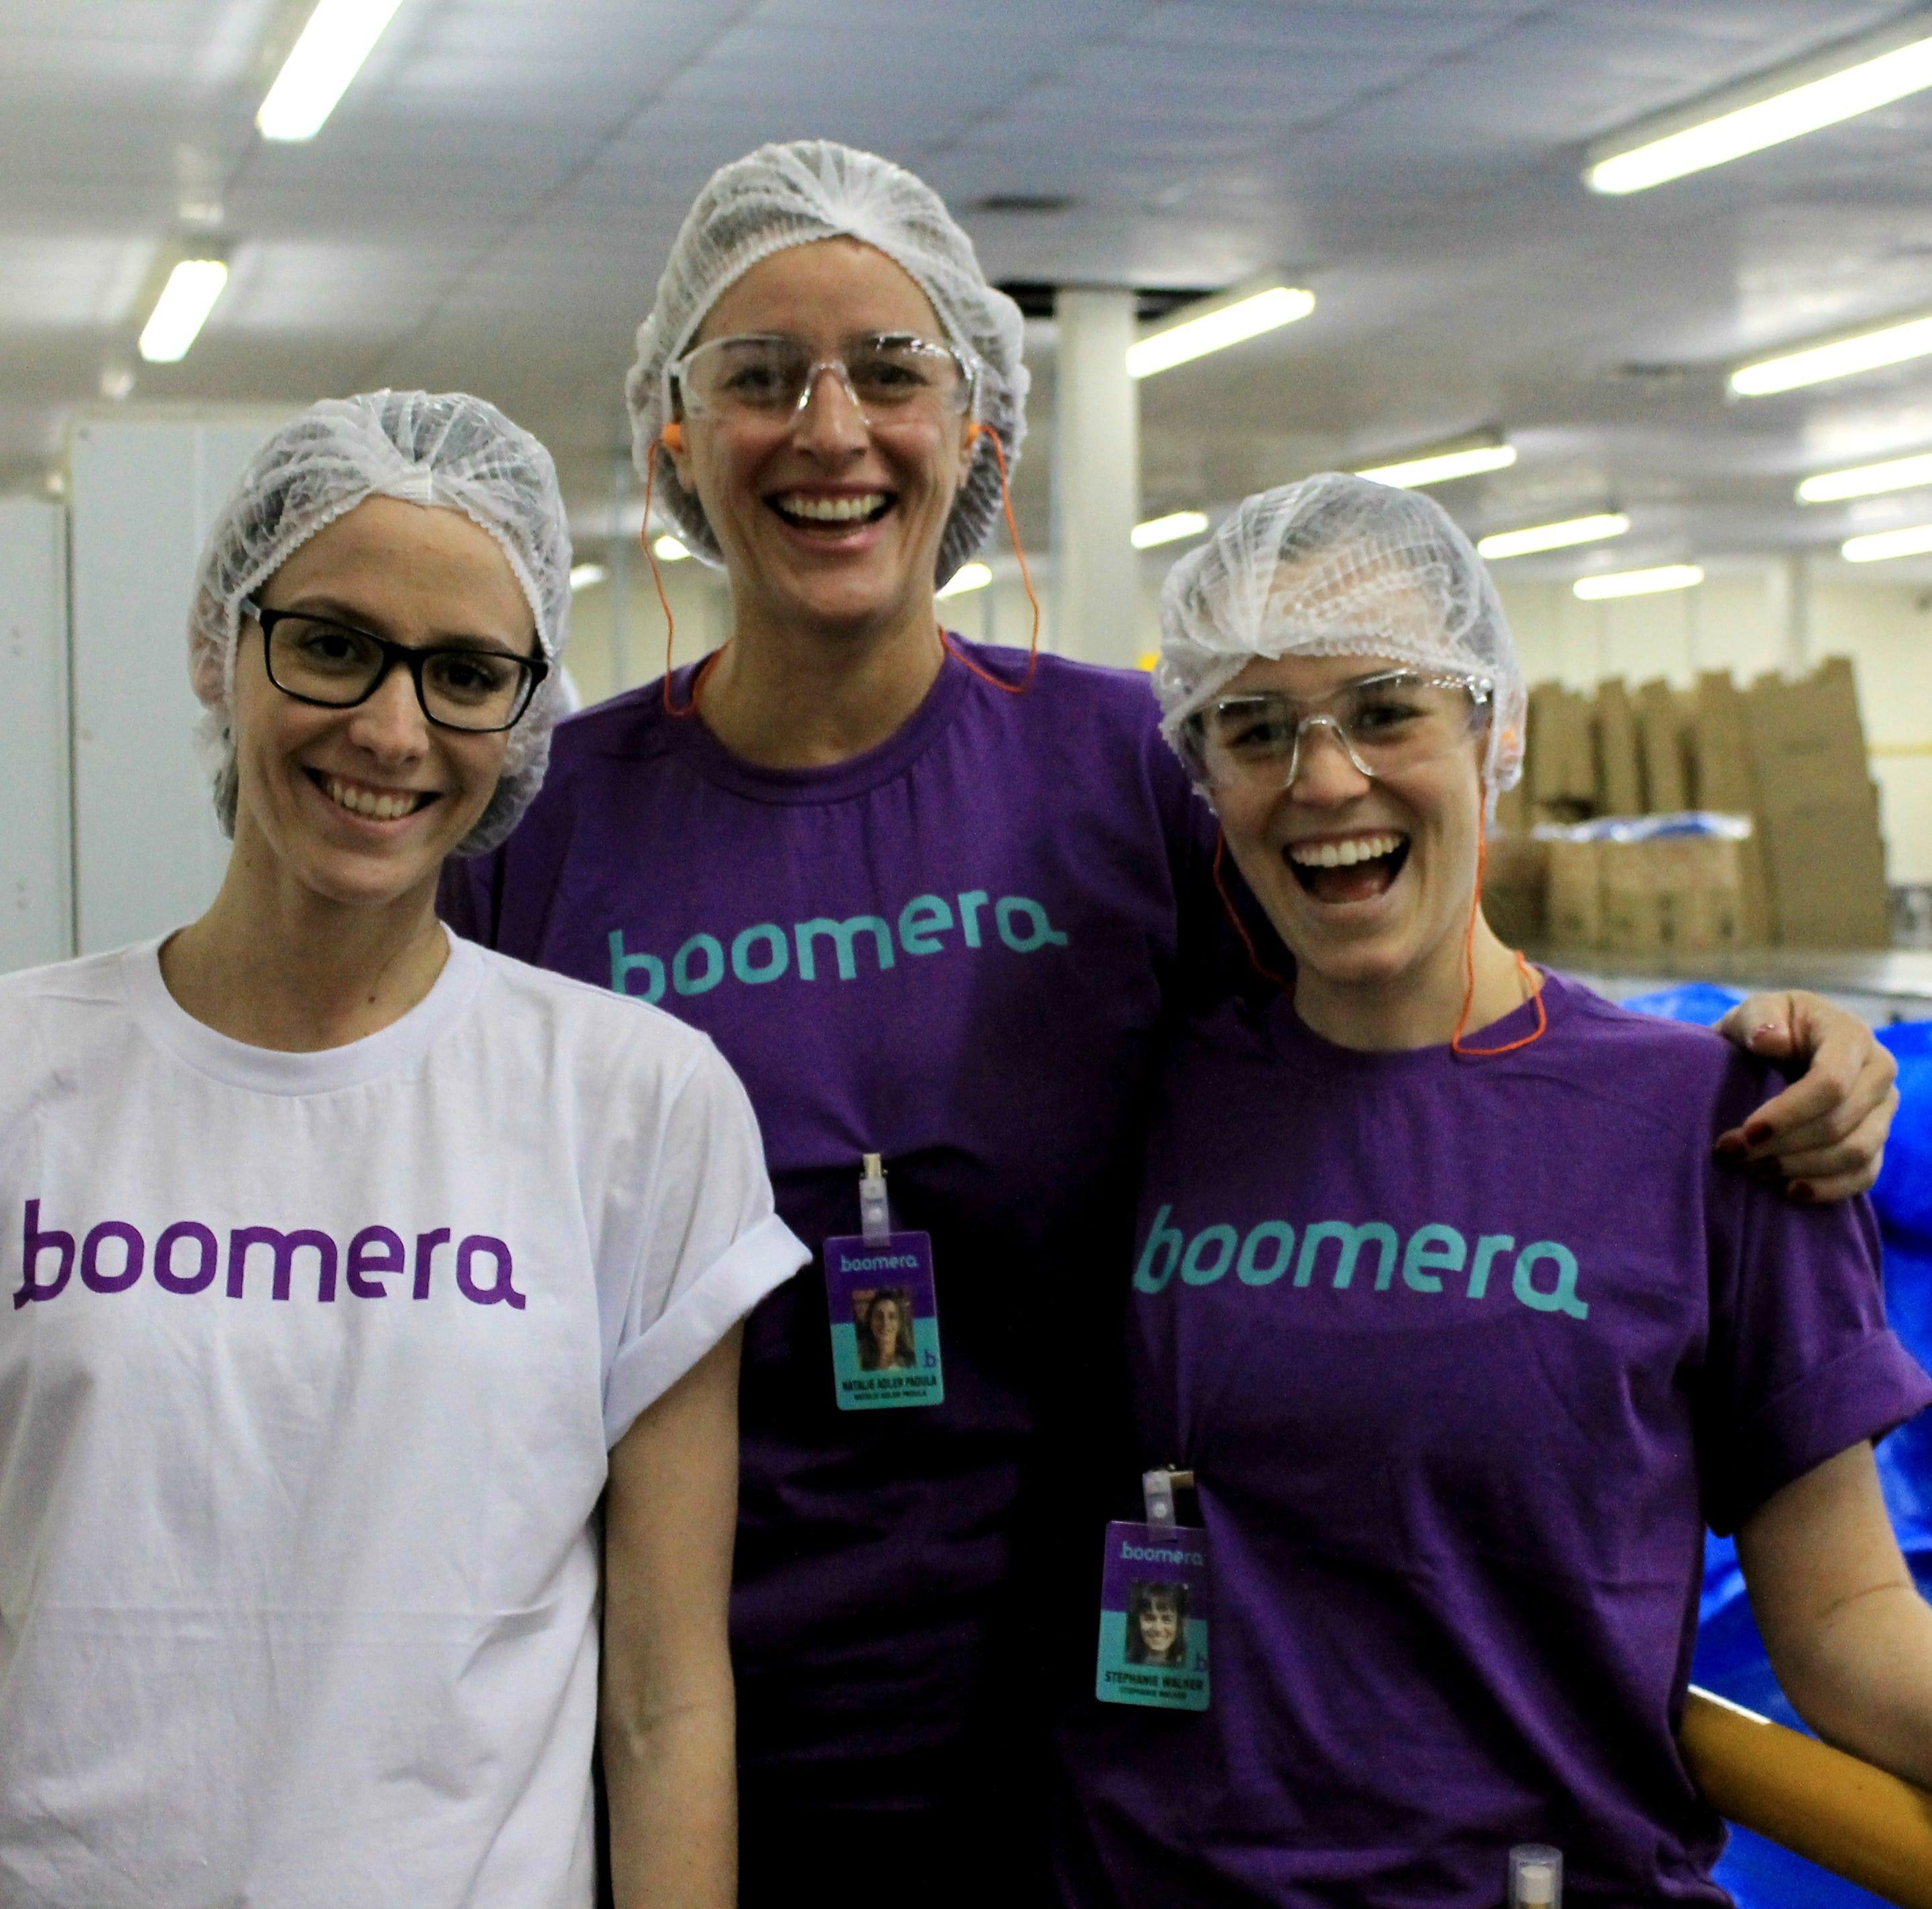 Boomera